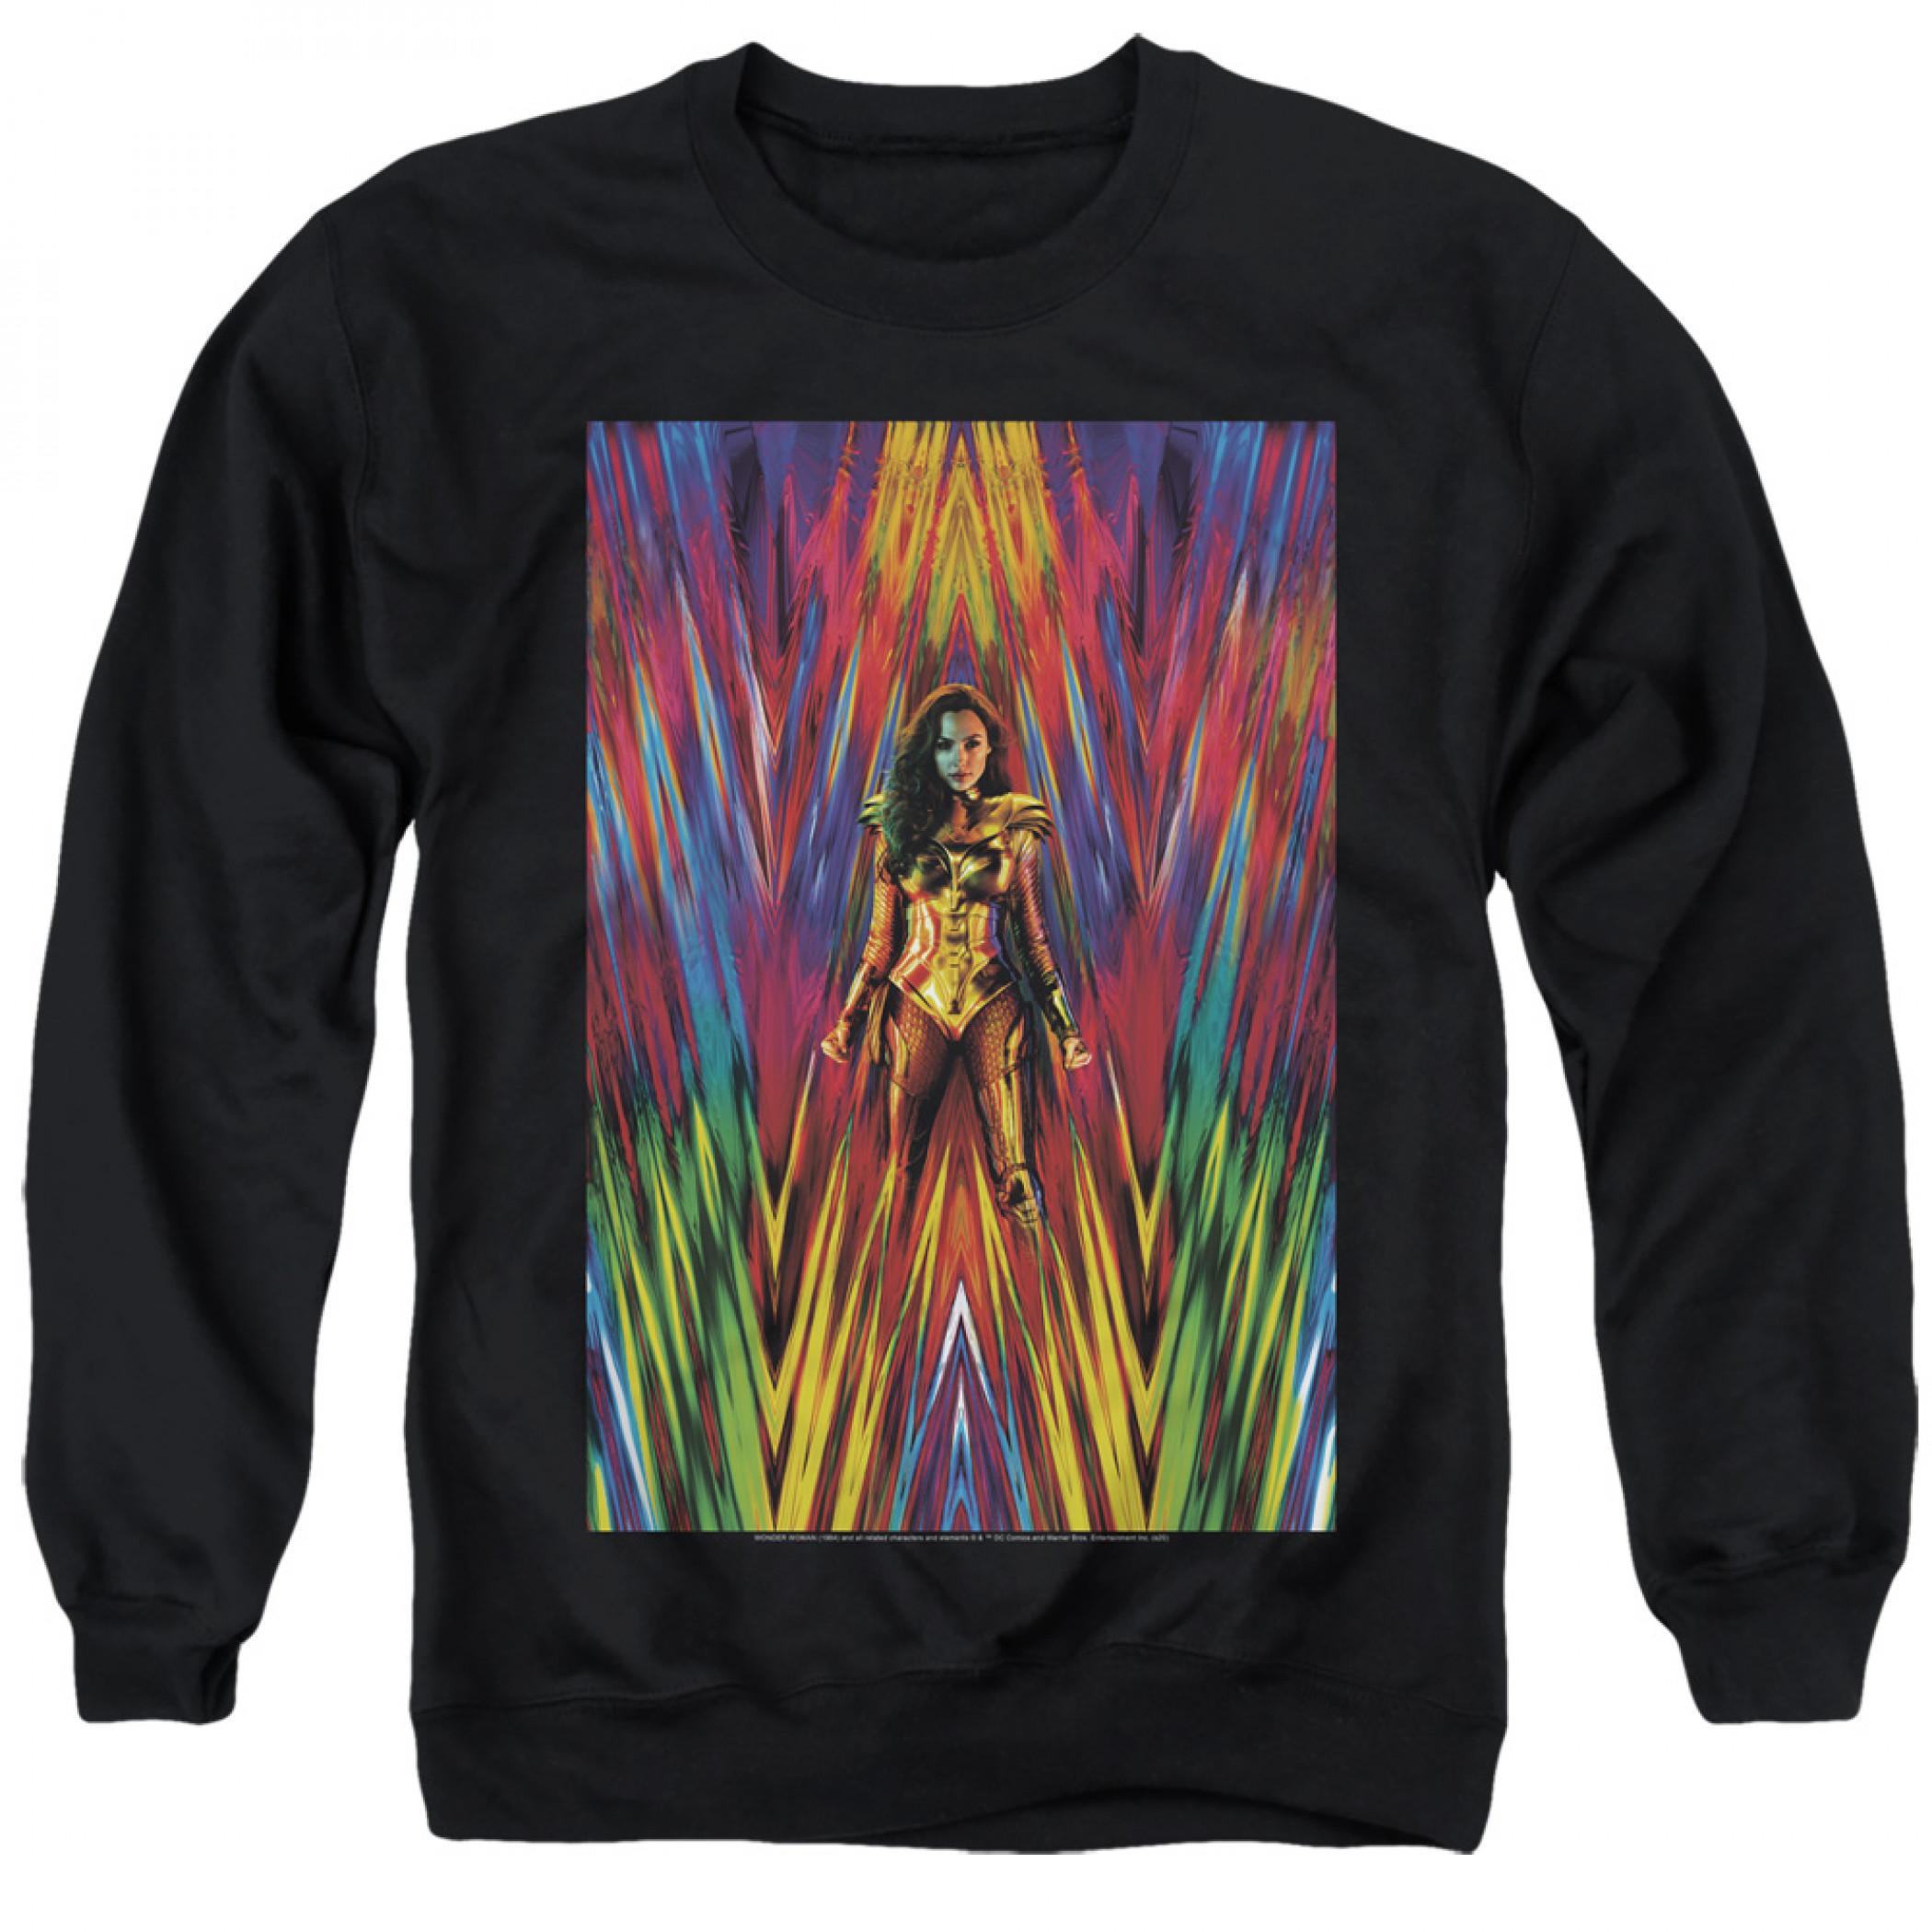 Wonder Woman 1984 Movie Poster Crewneck Sweater